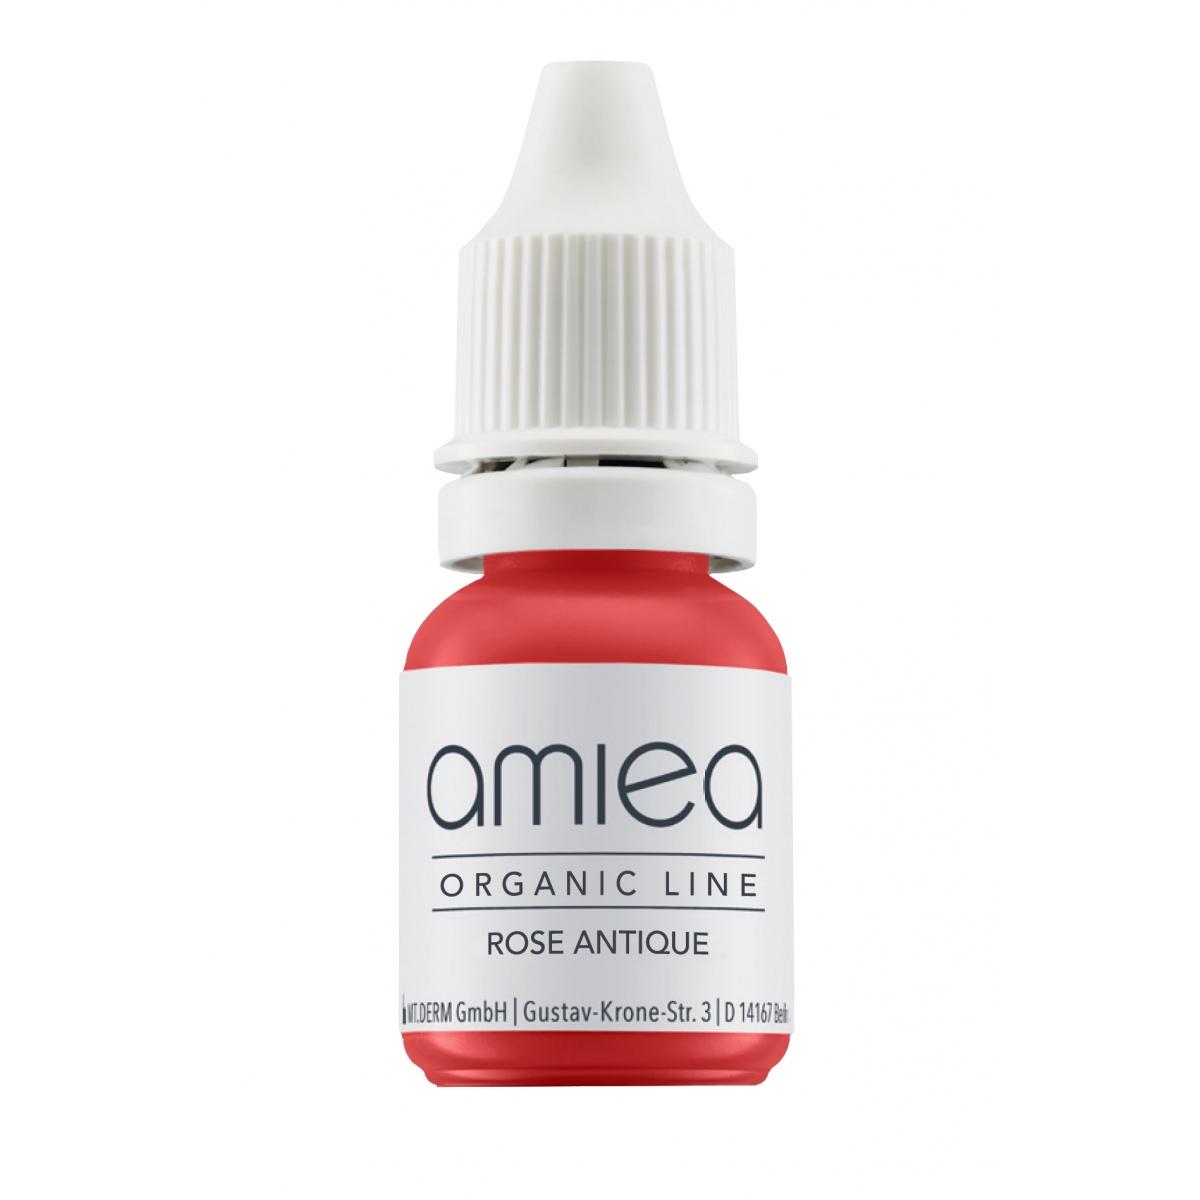 Organicline (5 ml)  - PIGMENTS AMIEA ORGANICLINE ROSE ANTIQUE, Flacon 5 ml